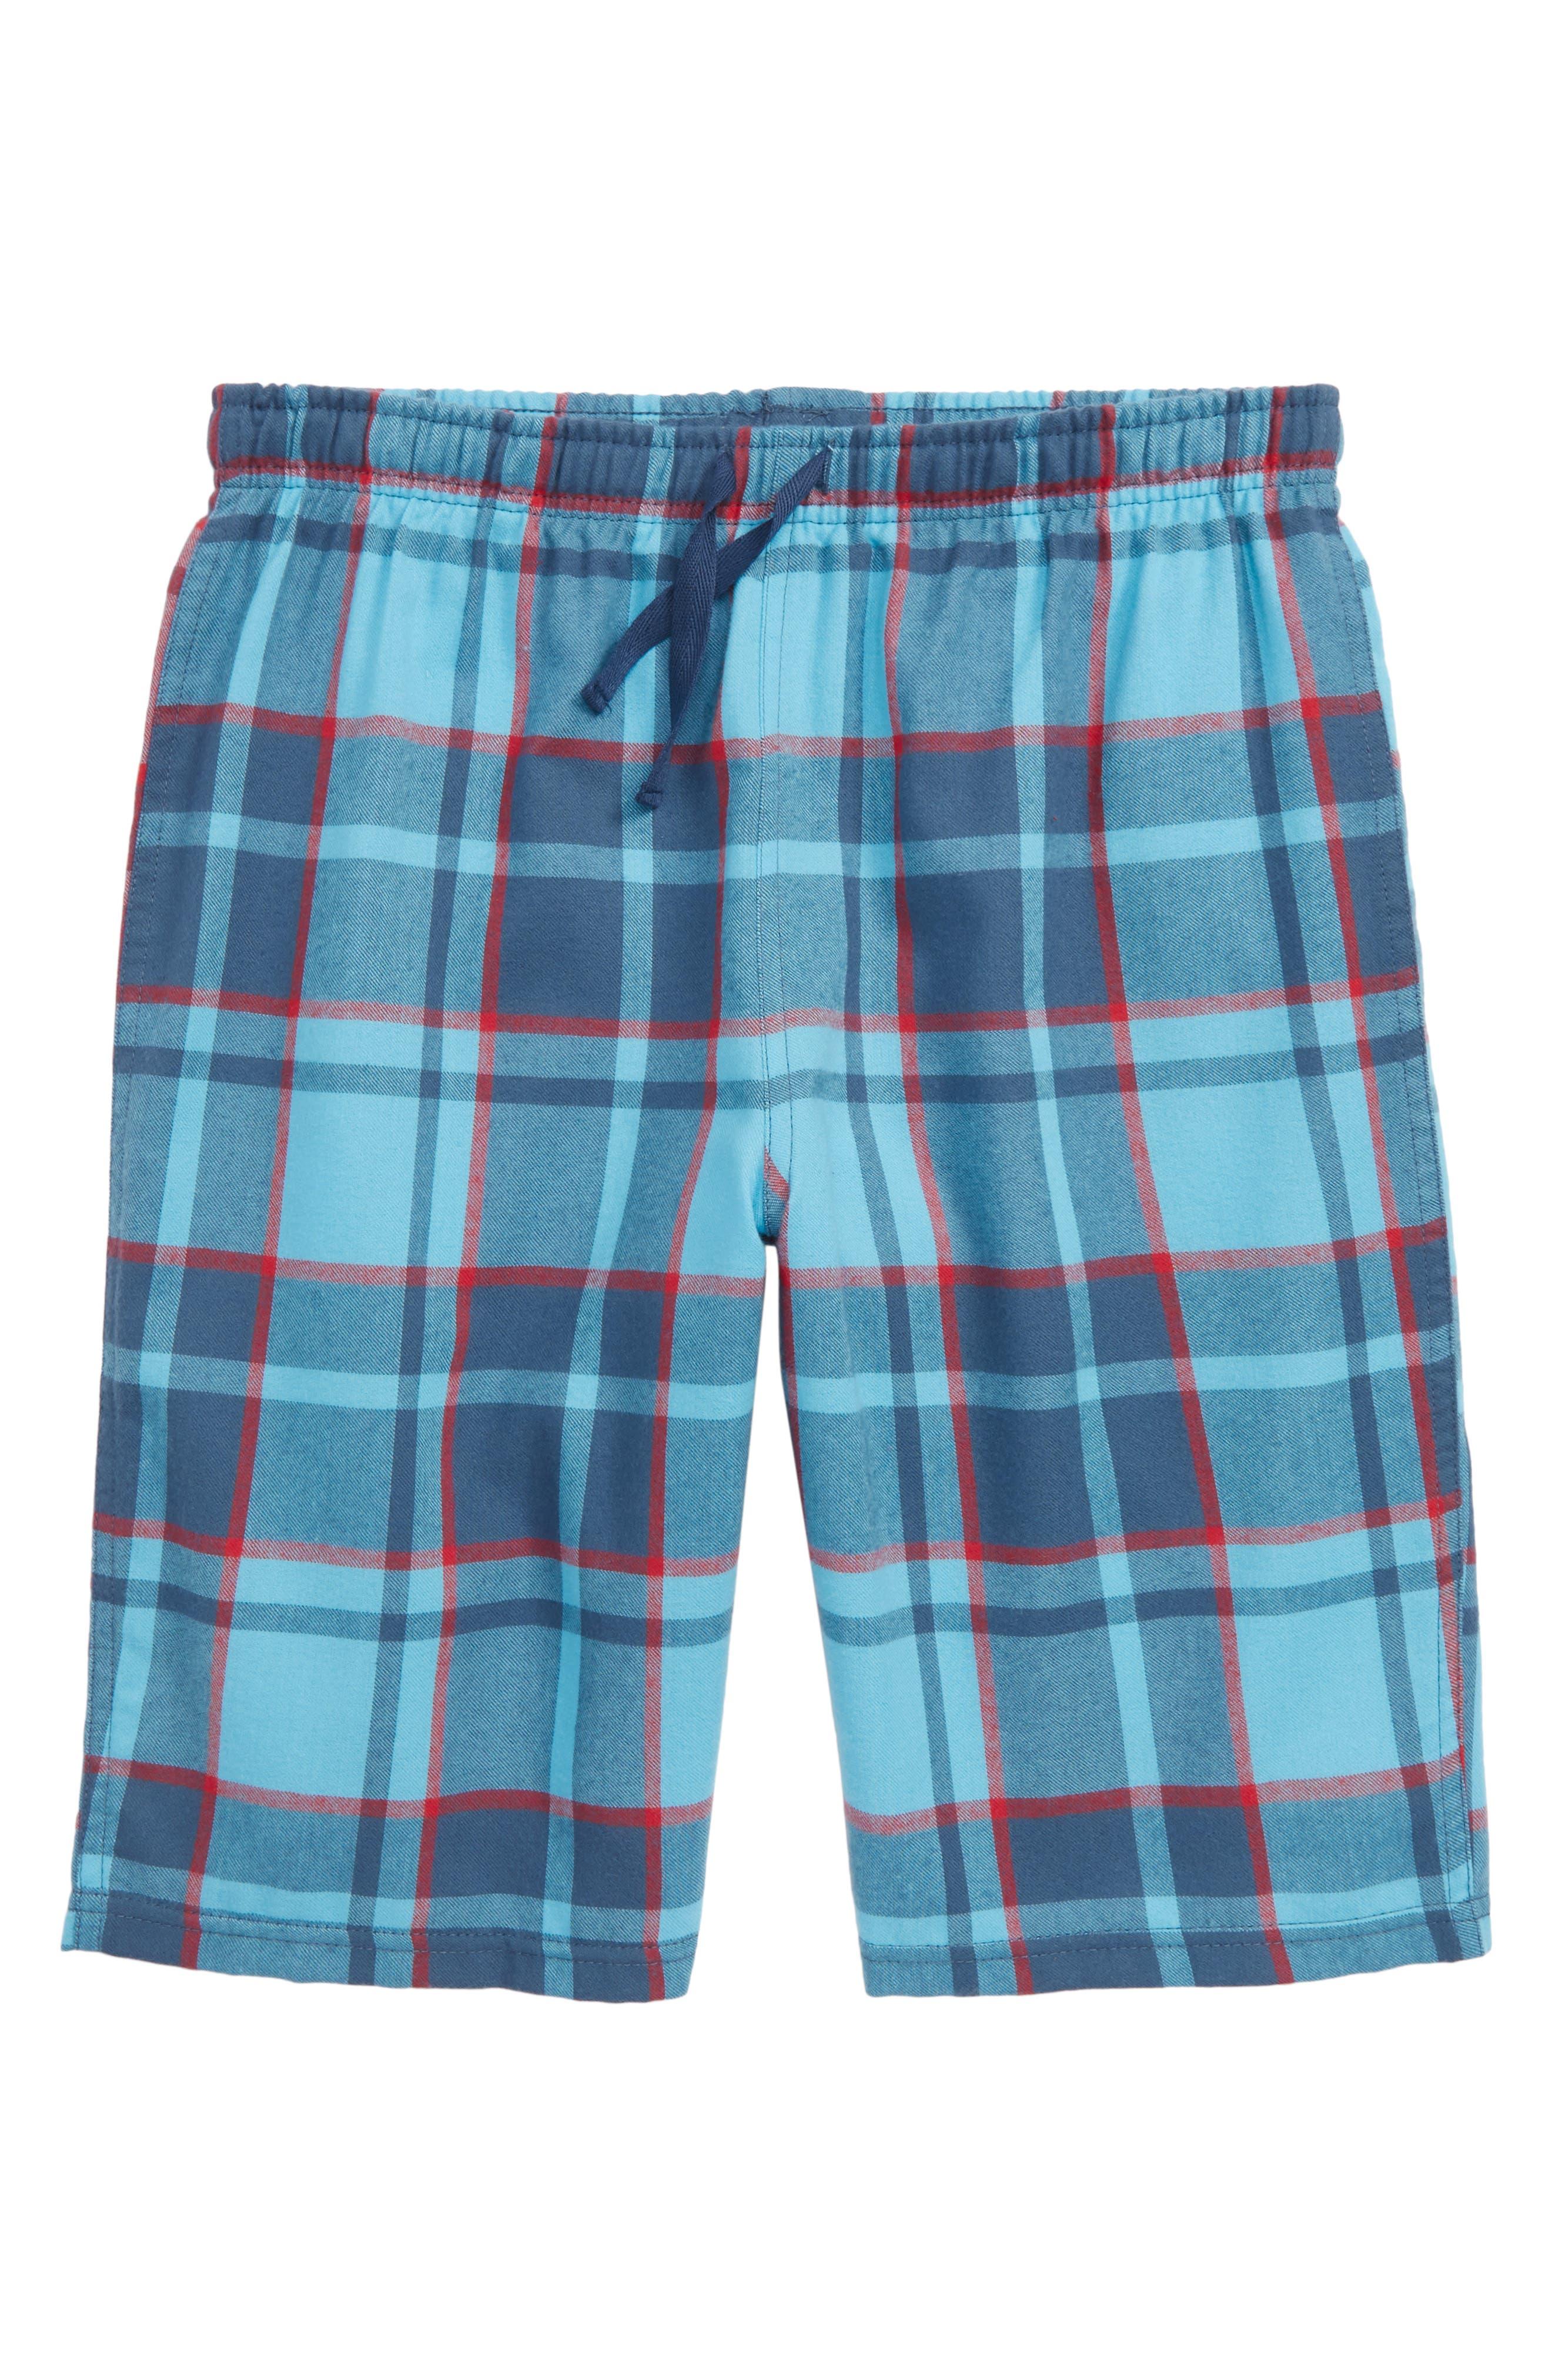 Flannel Shorts,                             Main thumbnail 1, color,                             Blue River- Navy Plaid